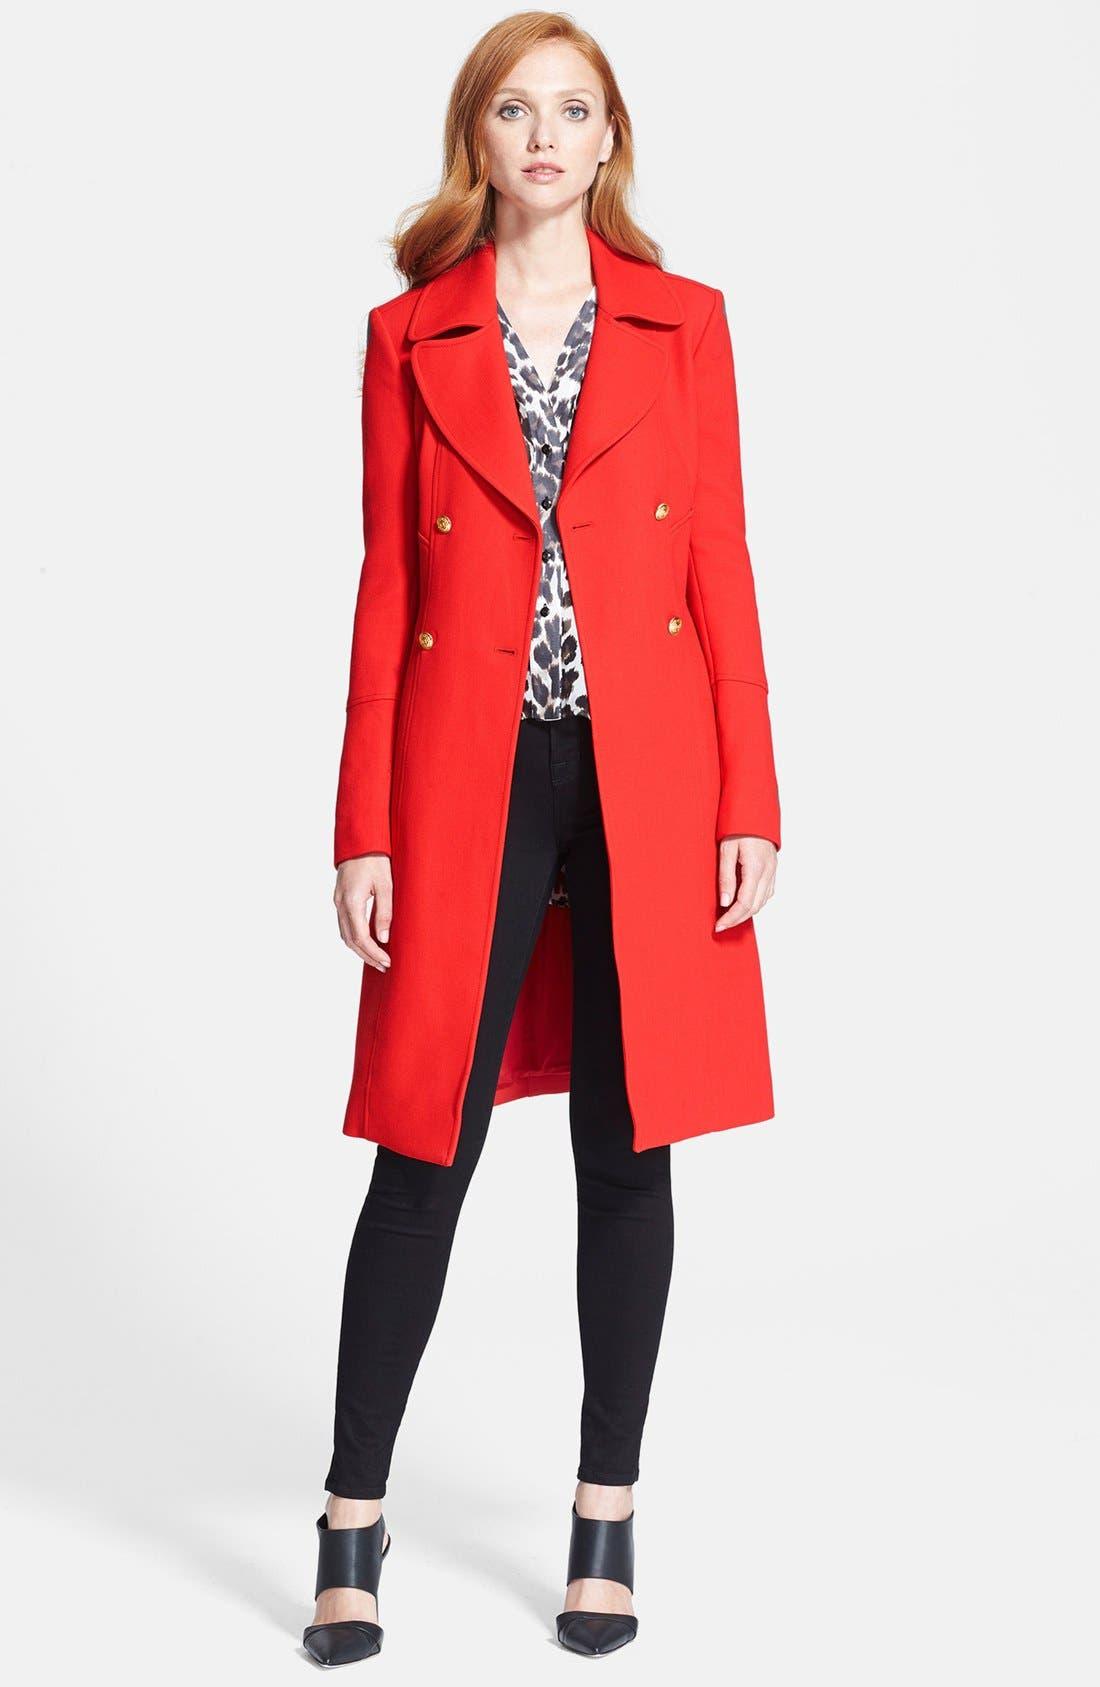 Alternate Image 1 Selected - Diane von Furstenberg 'Mirabella' Wool Blend Coat